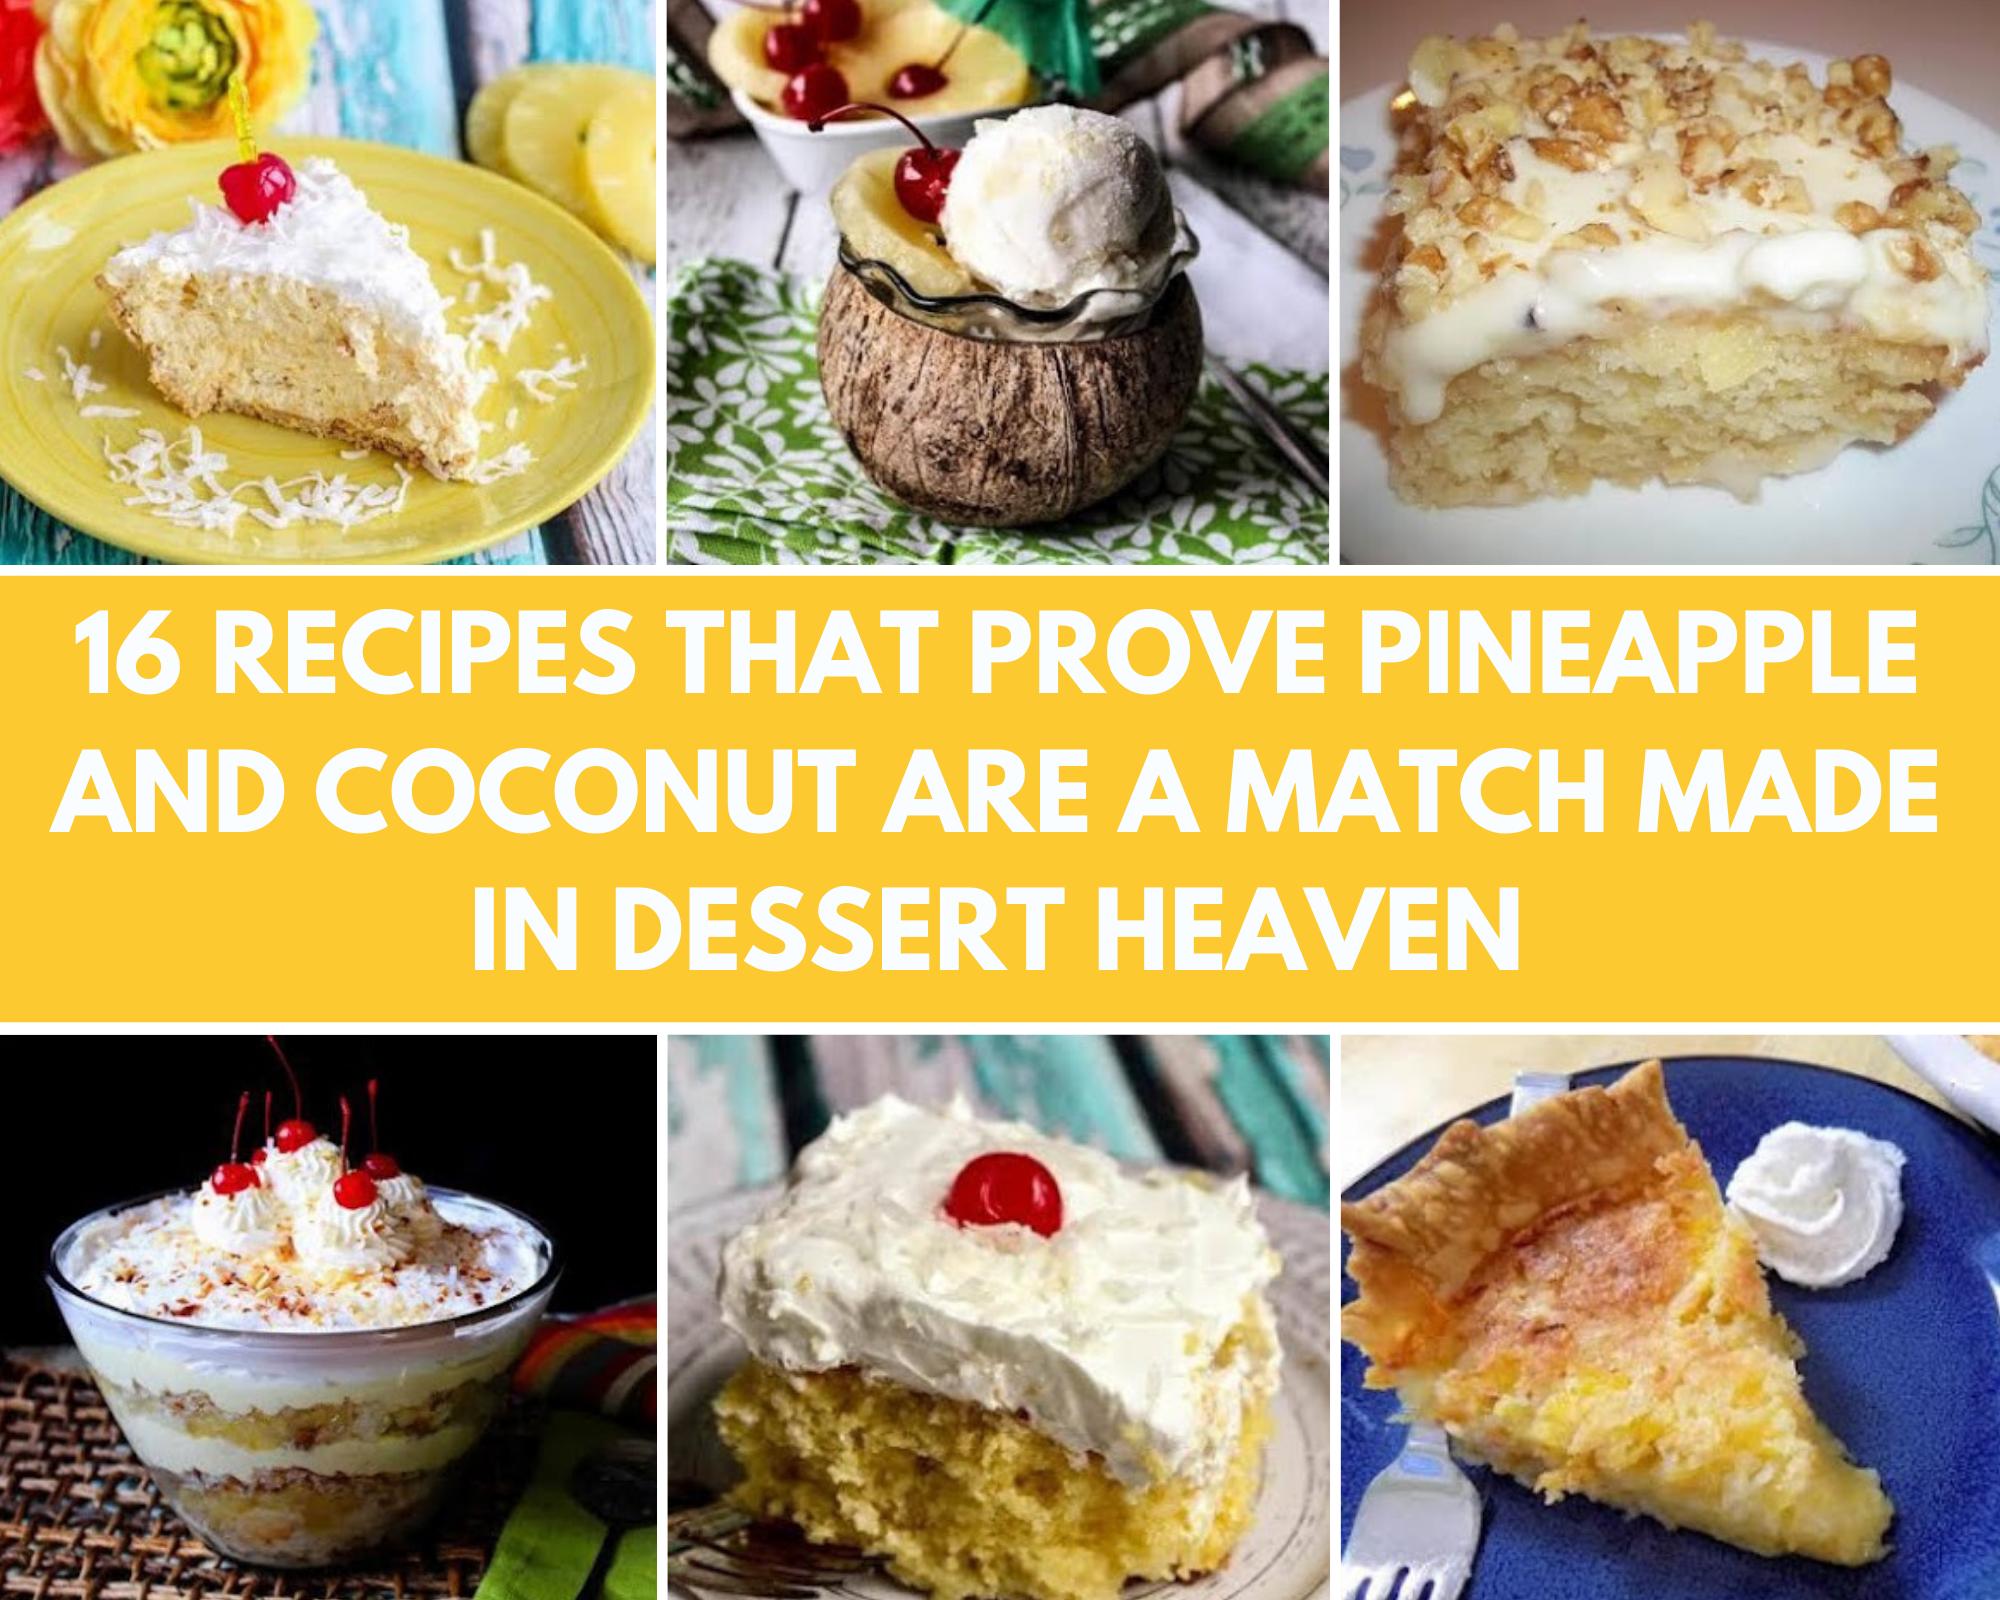 Pineapple coconut dessert recipes